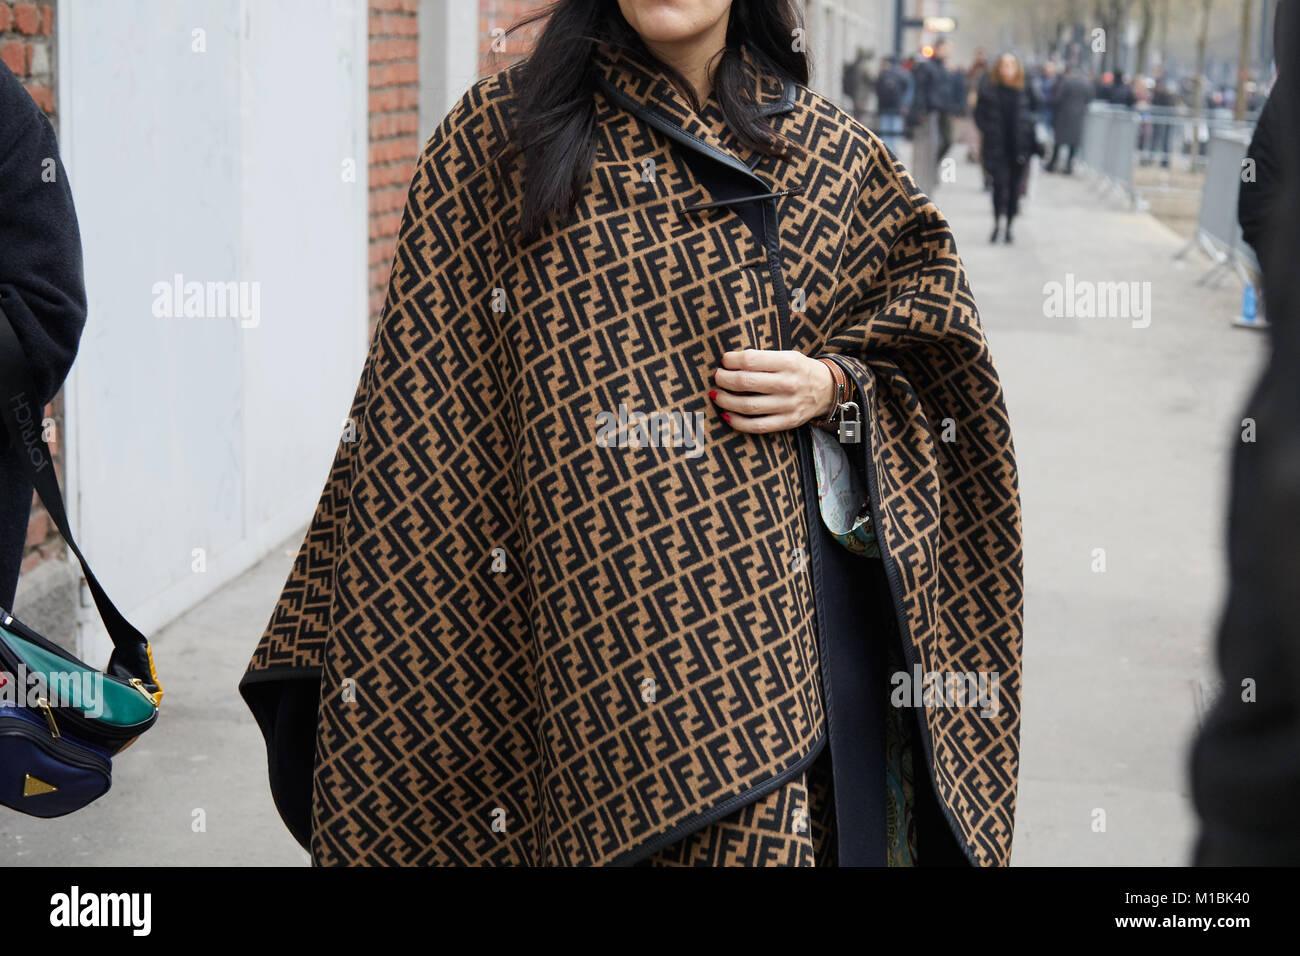 MILAN - JANUARY 15: Woman with brown and black Fendi cloak before Fendi fashion show, Milan Fashion Week street - Stock Image